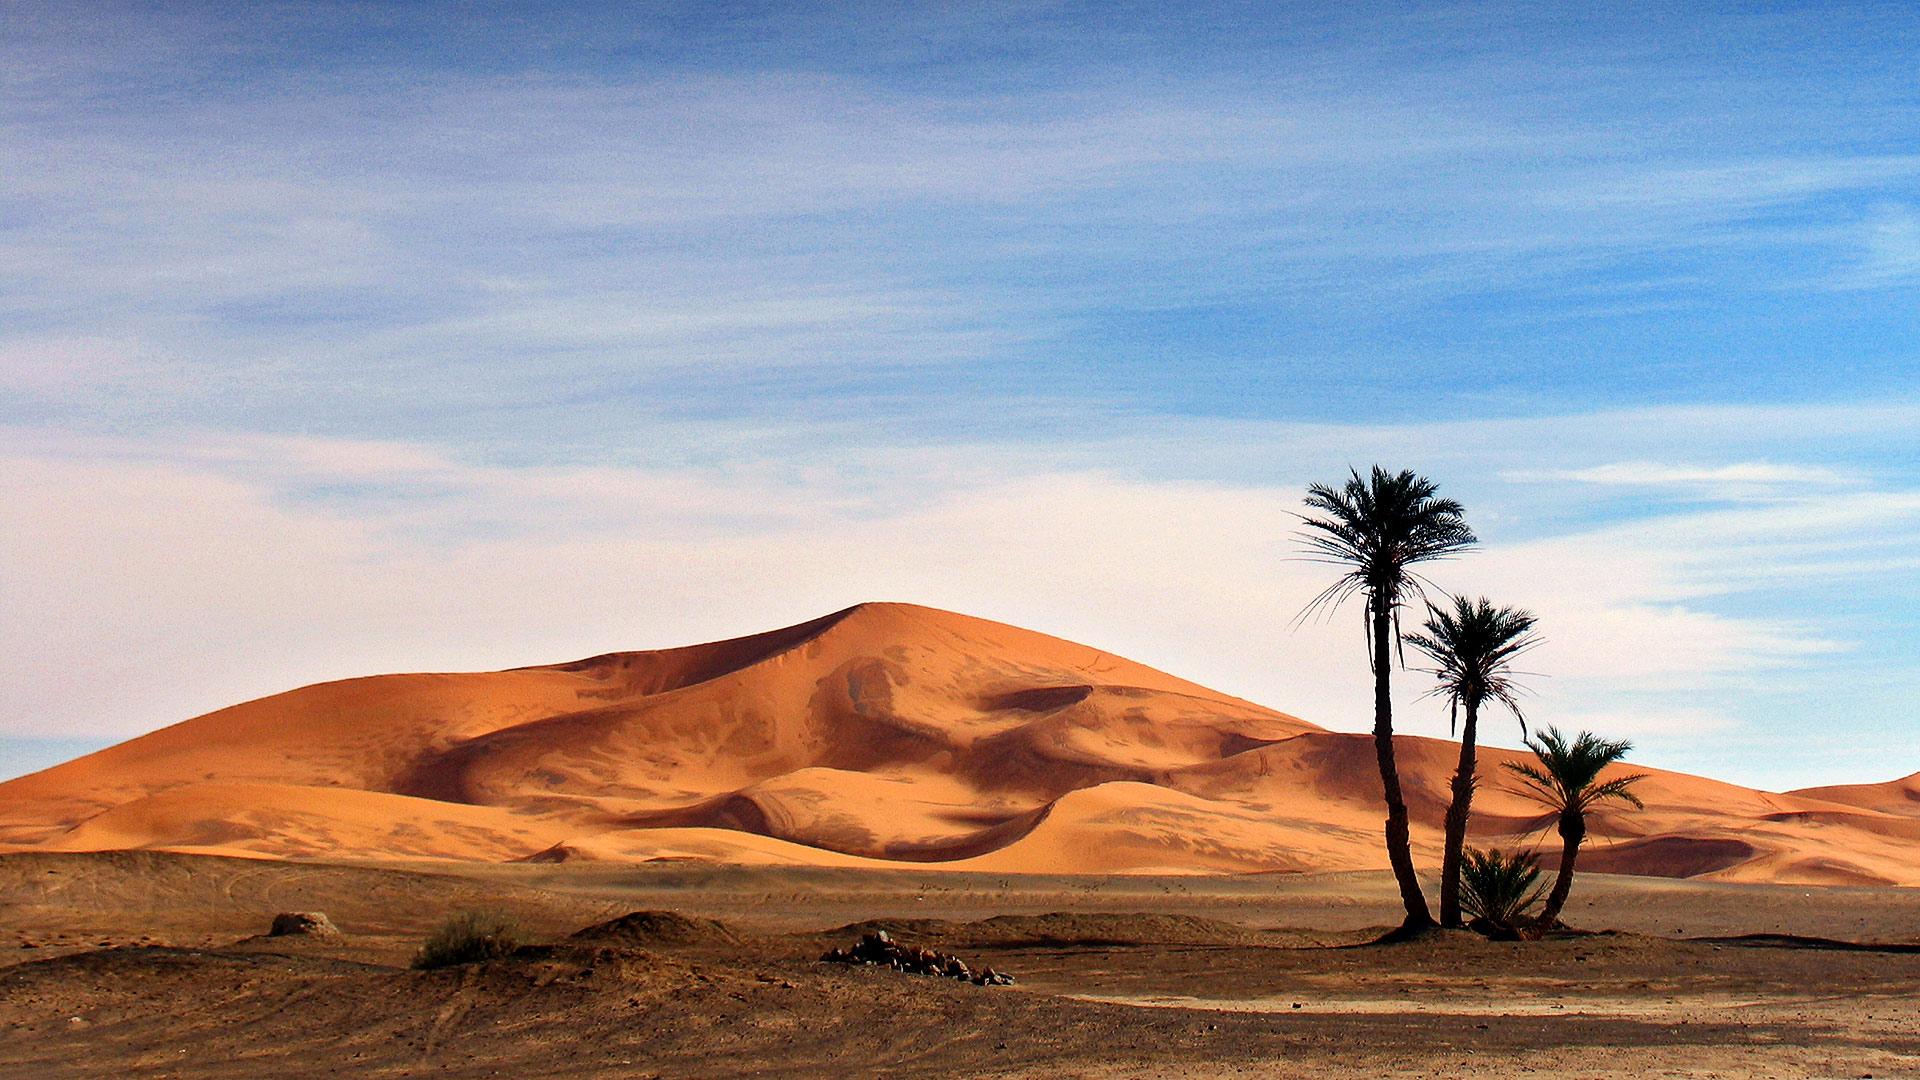 Merzouga. Morocco